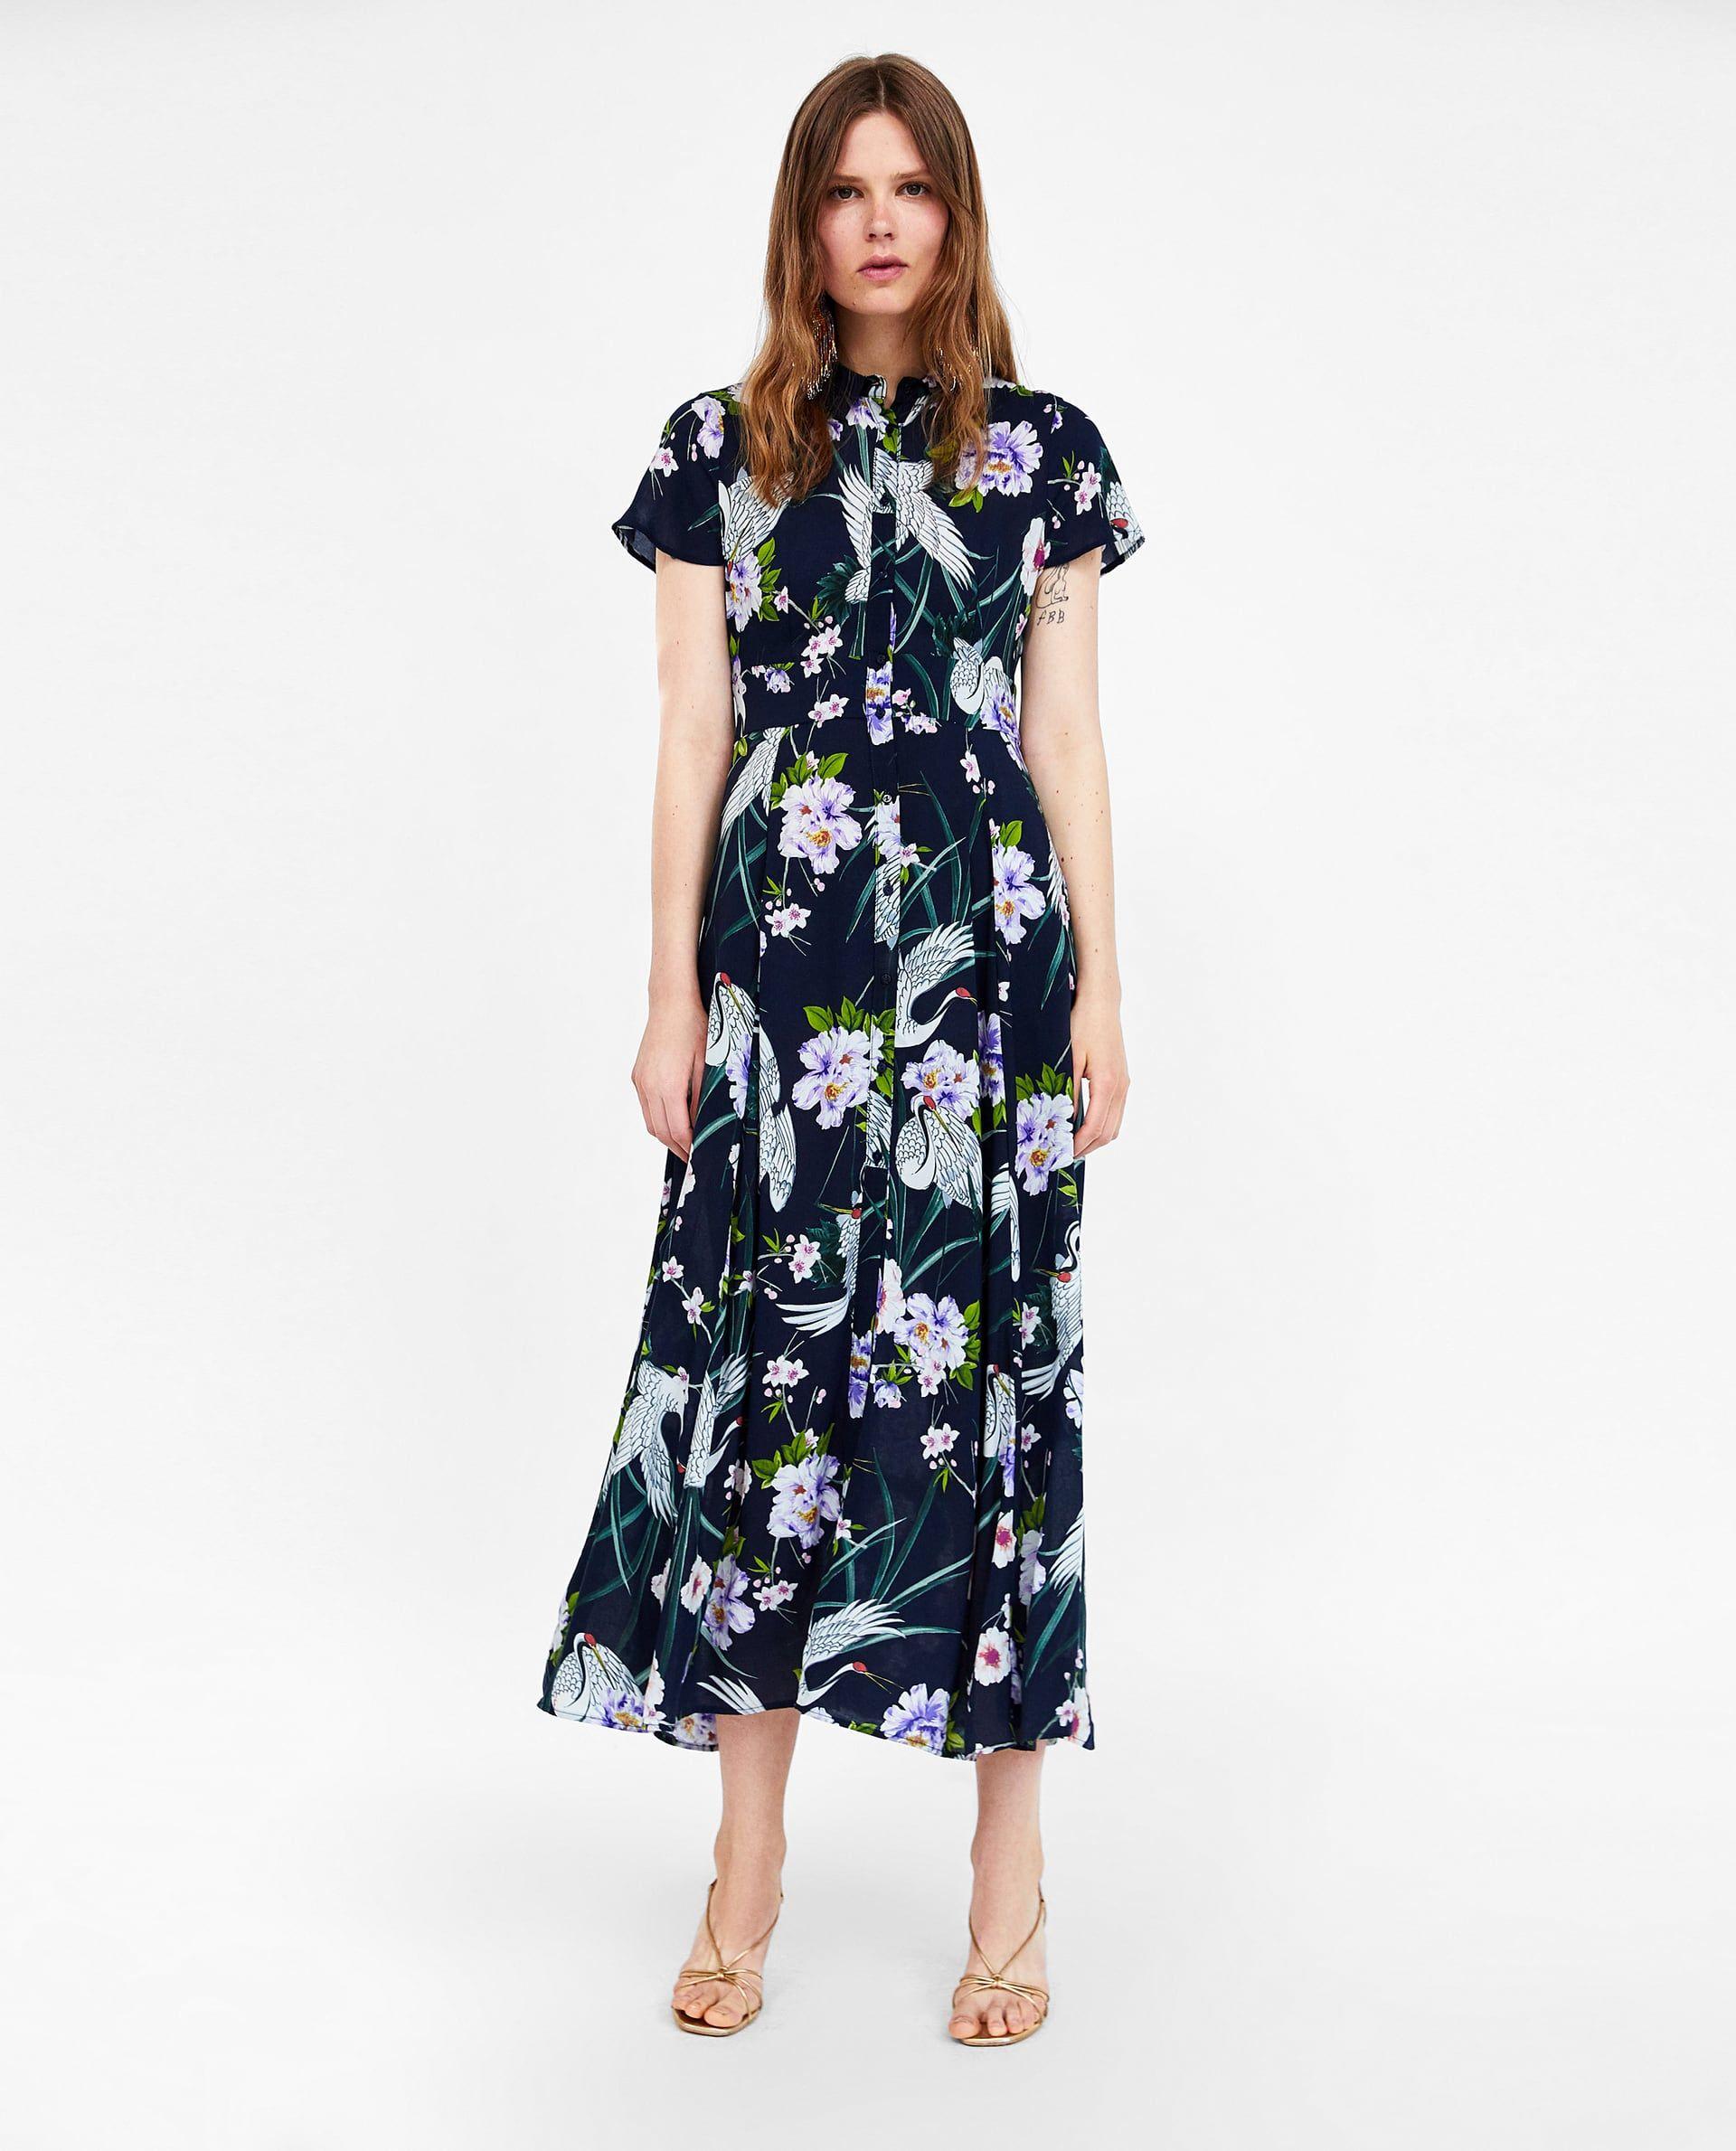 b5e061f21eb Image 1 of LONG FLORAL PRINT DRESS from Zara